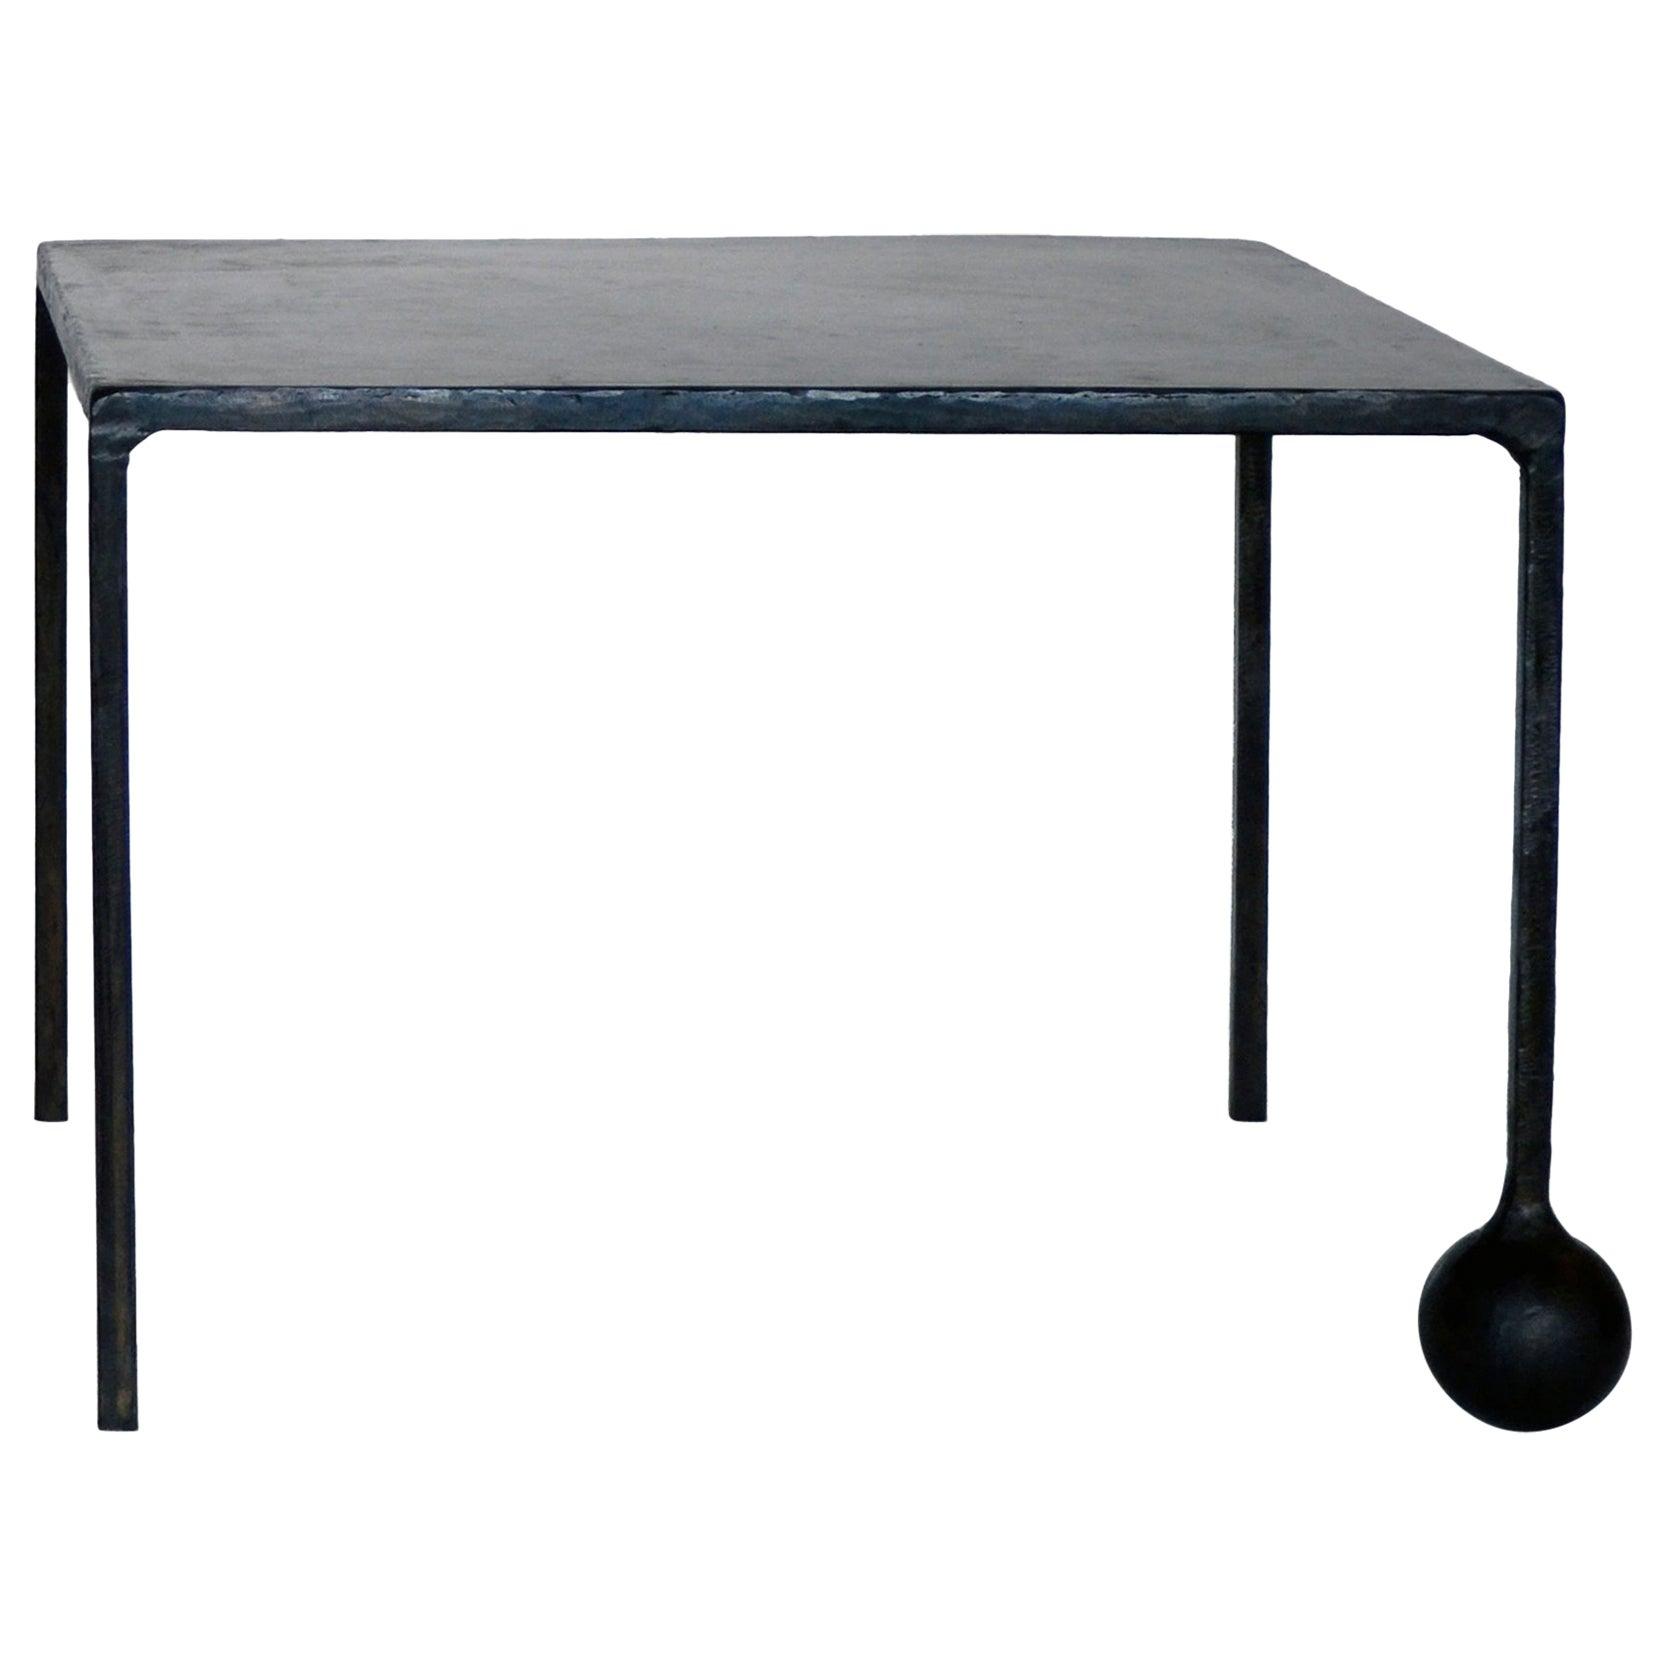 End/Side Table Modern Geometric Handmade Carved Blackened Waxed Steel Minimalist